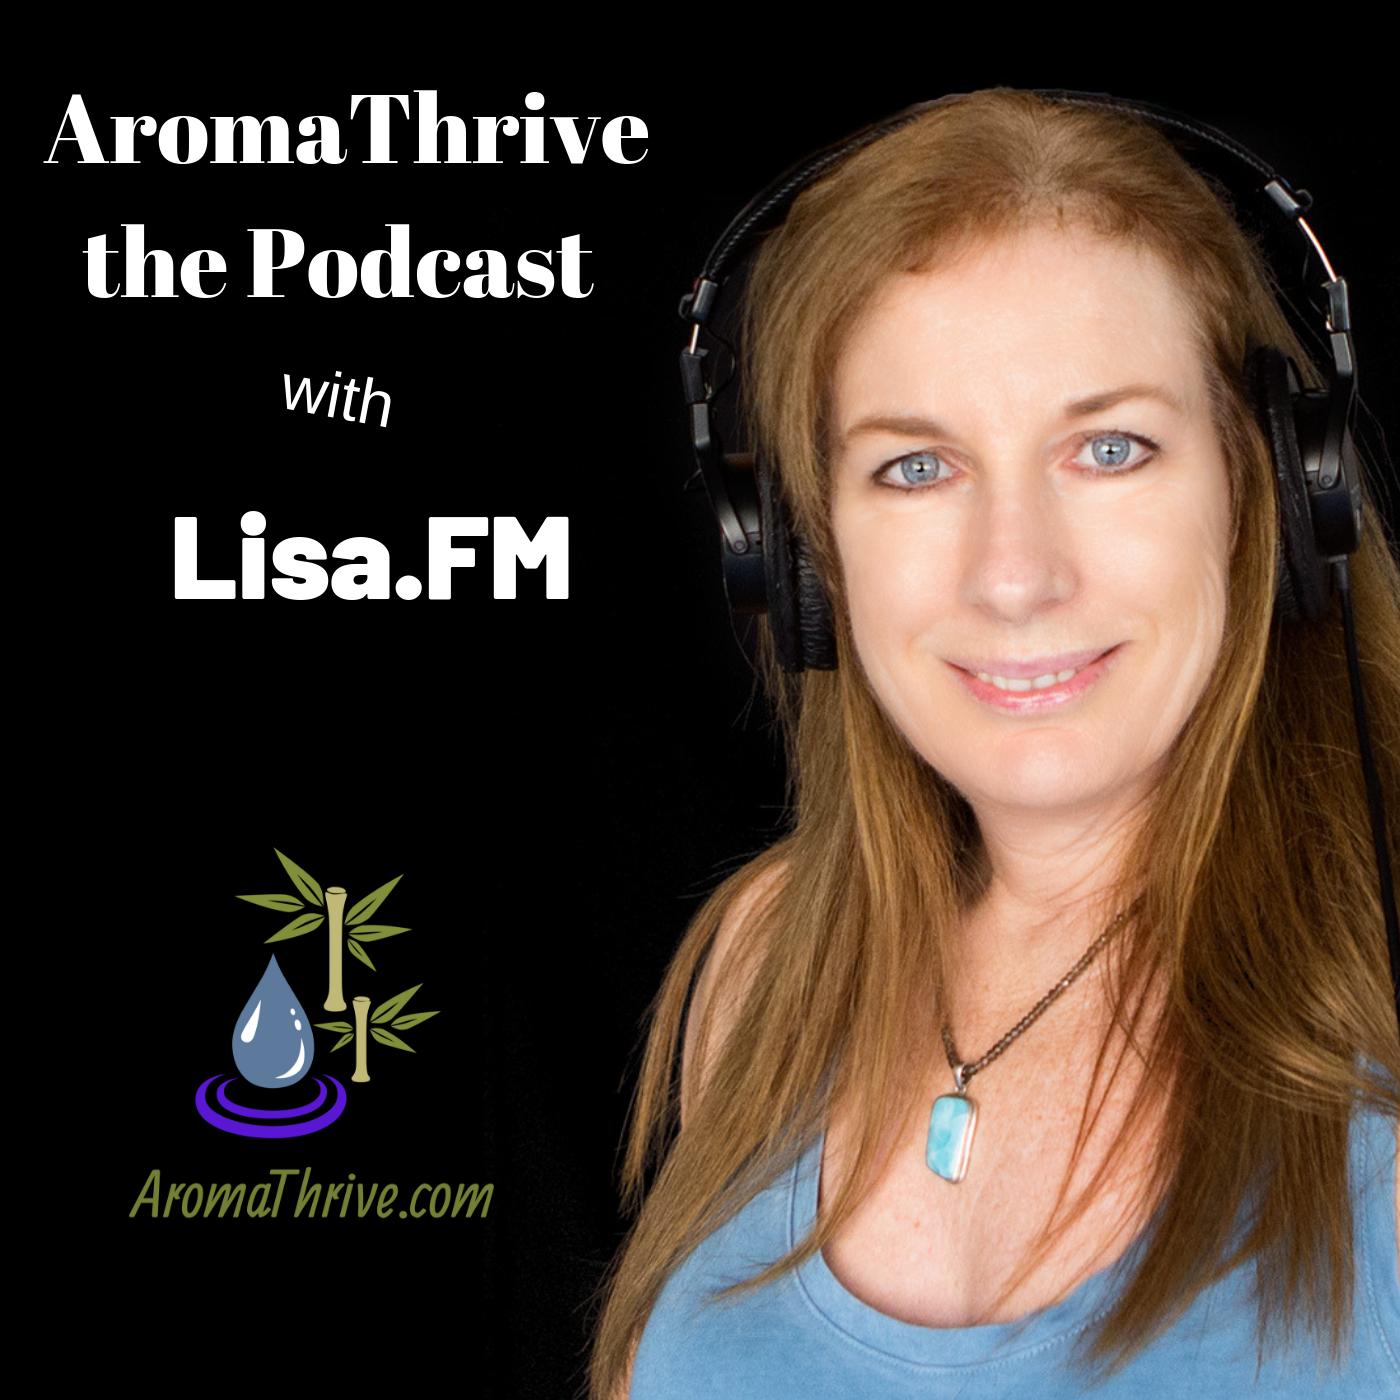 AromaThrive with Lisa show art